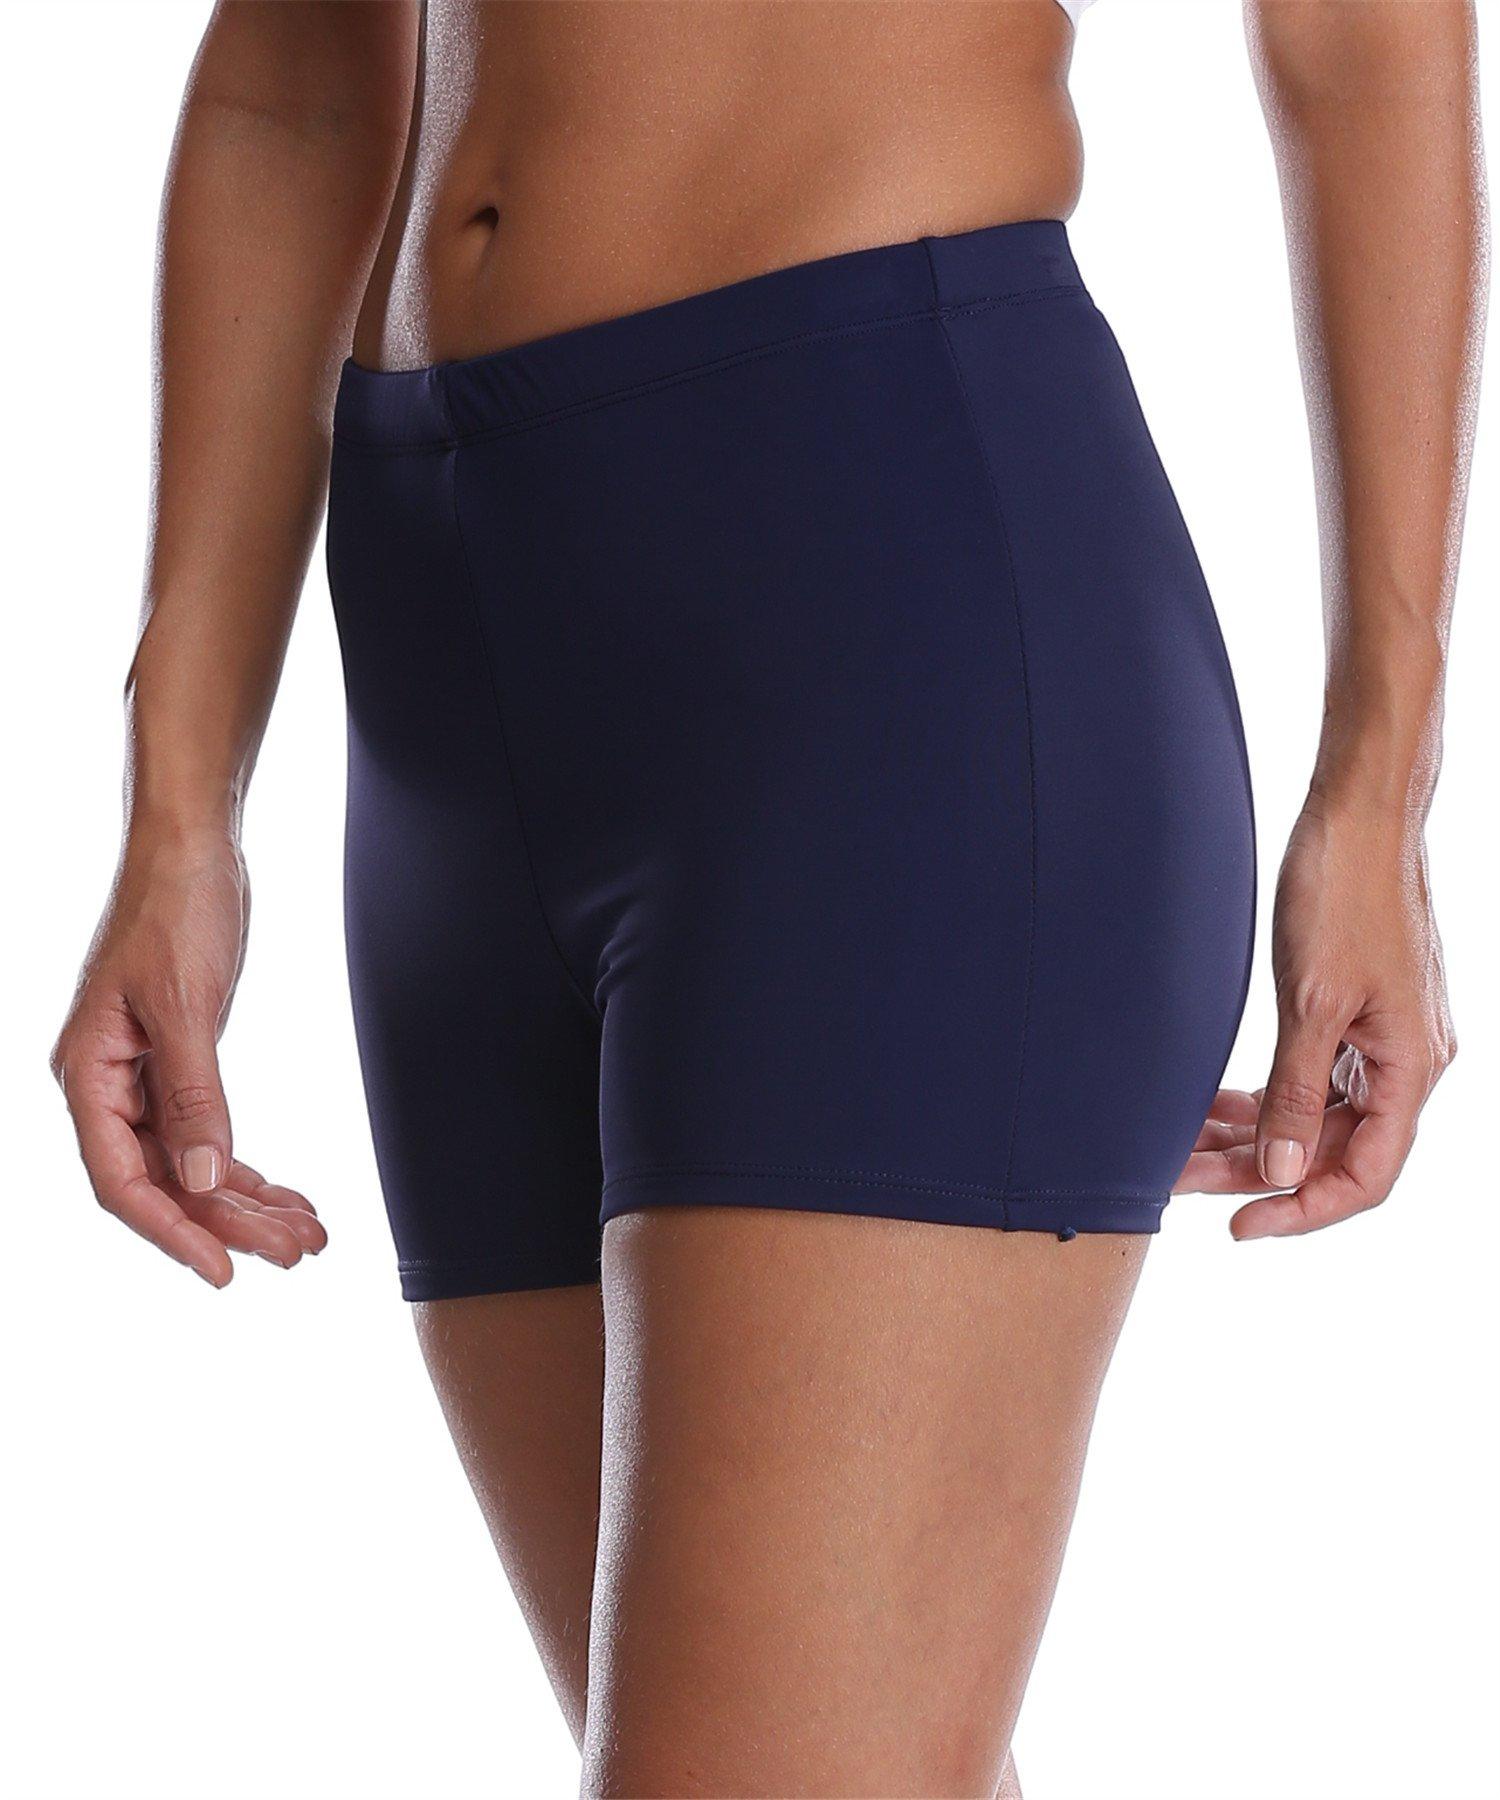 Maysoul Womens Plus Size Beach Swim Shorts Active Training Beach Board Shorts 18